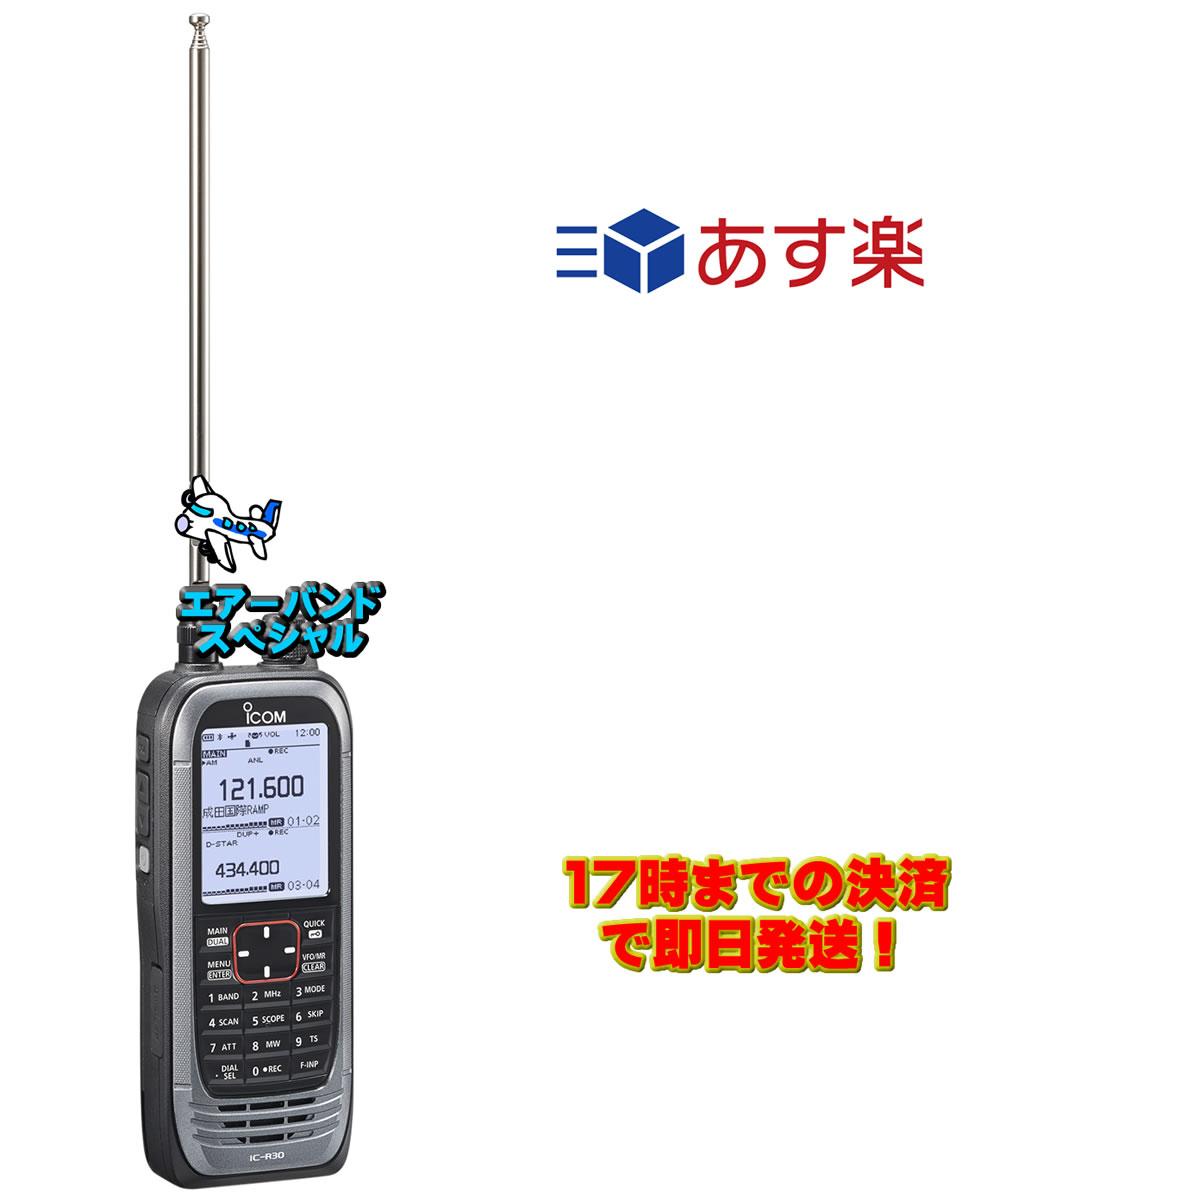 IC-R30 エアーバンドスペシャル アイコム 広帯域レシーバー